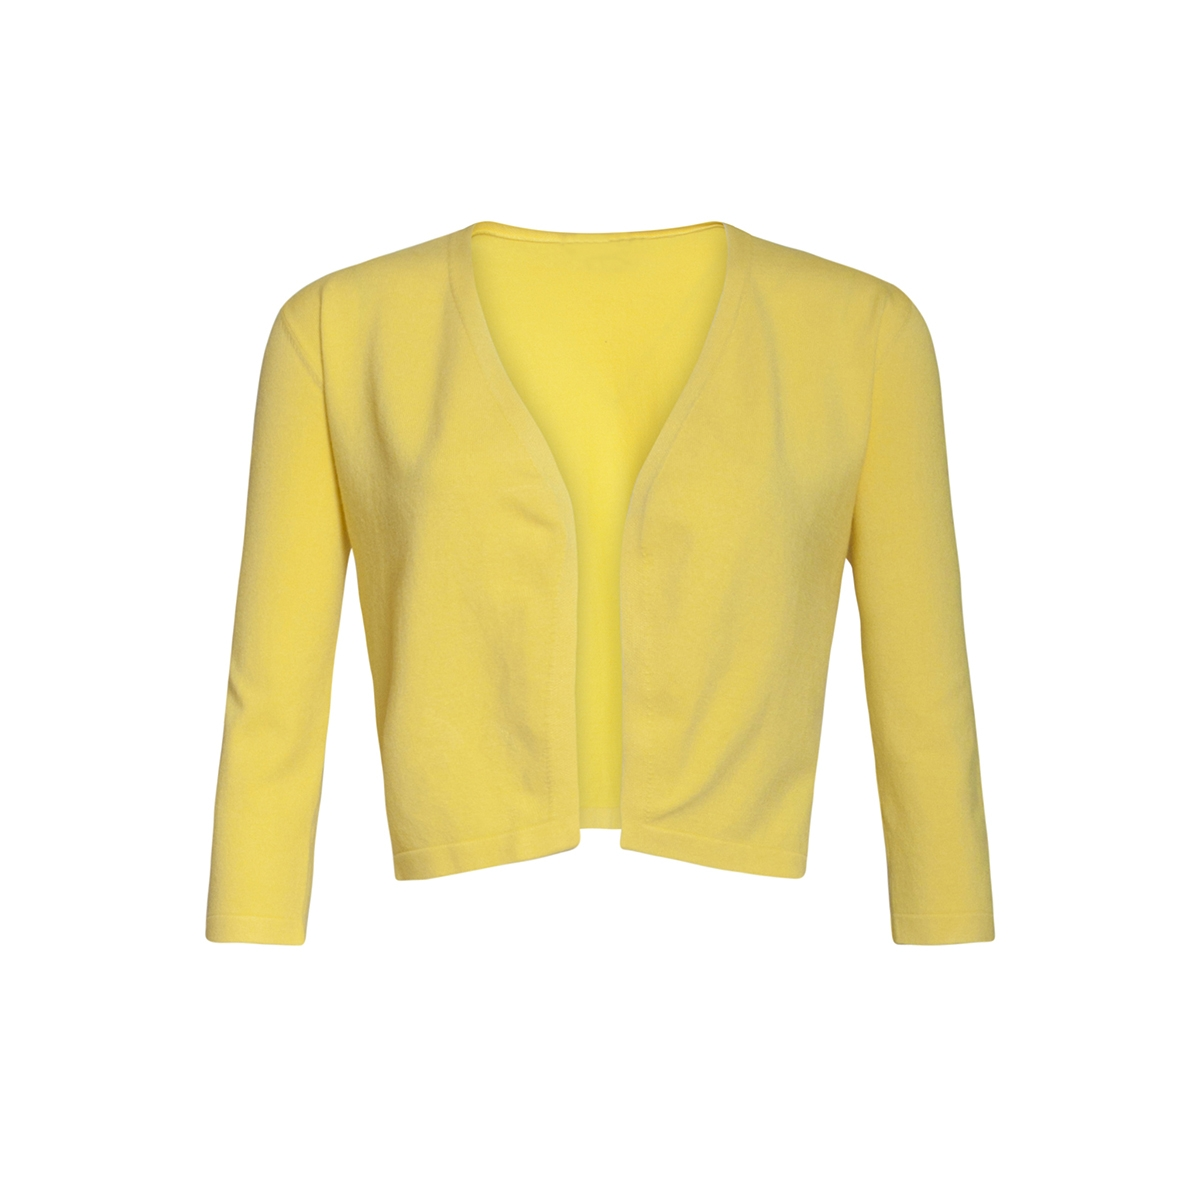 cardigan 90001 smashed lemon bolero yellow